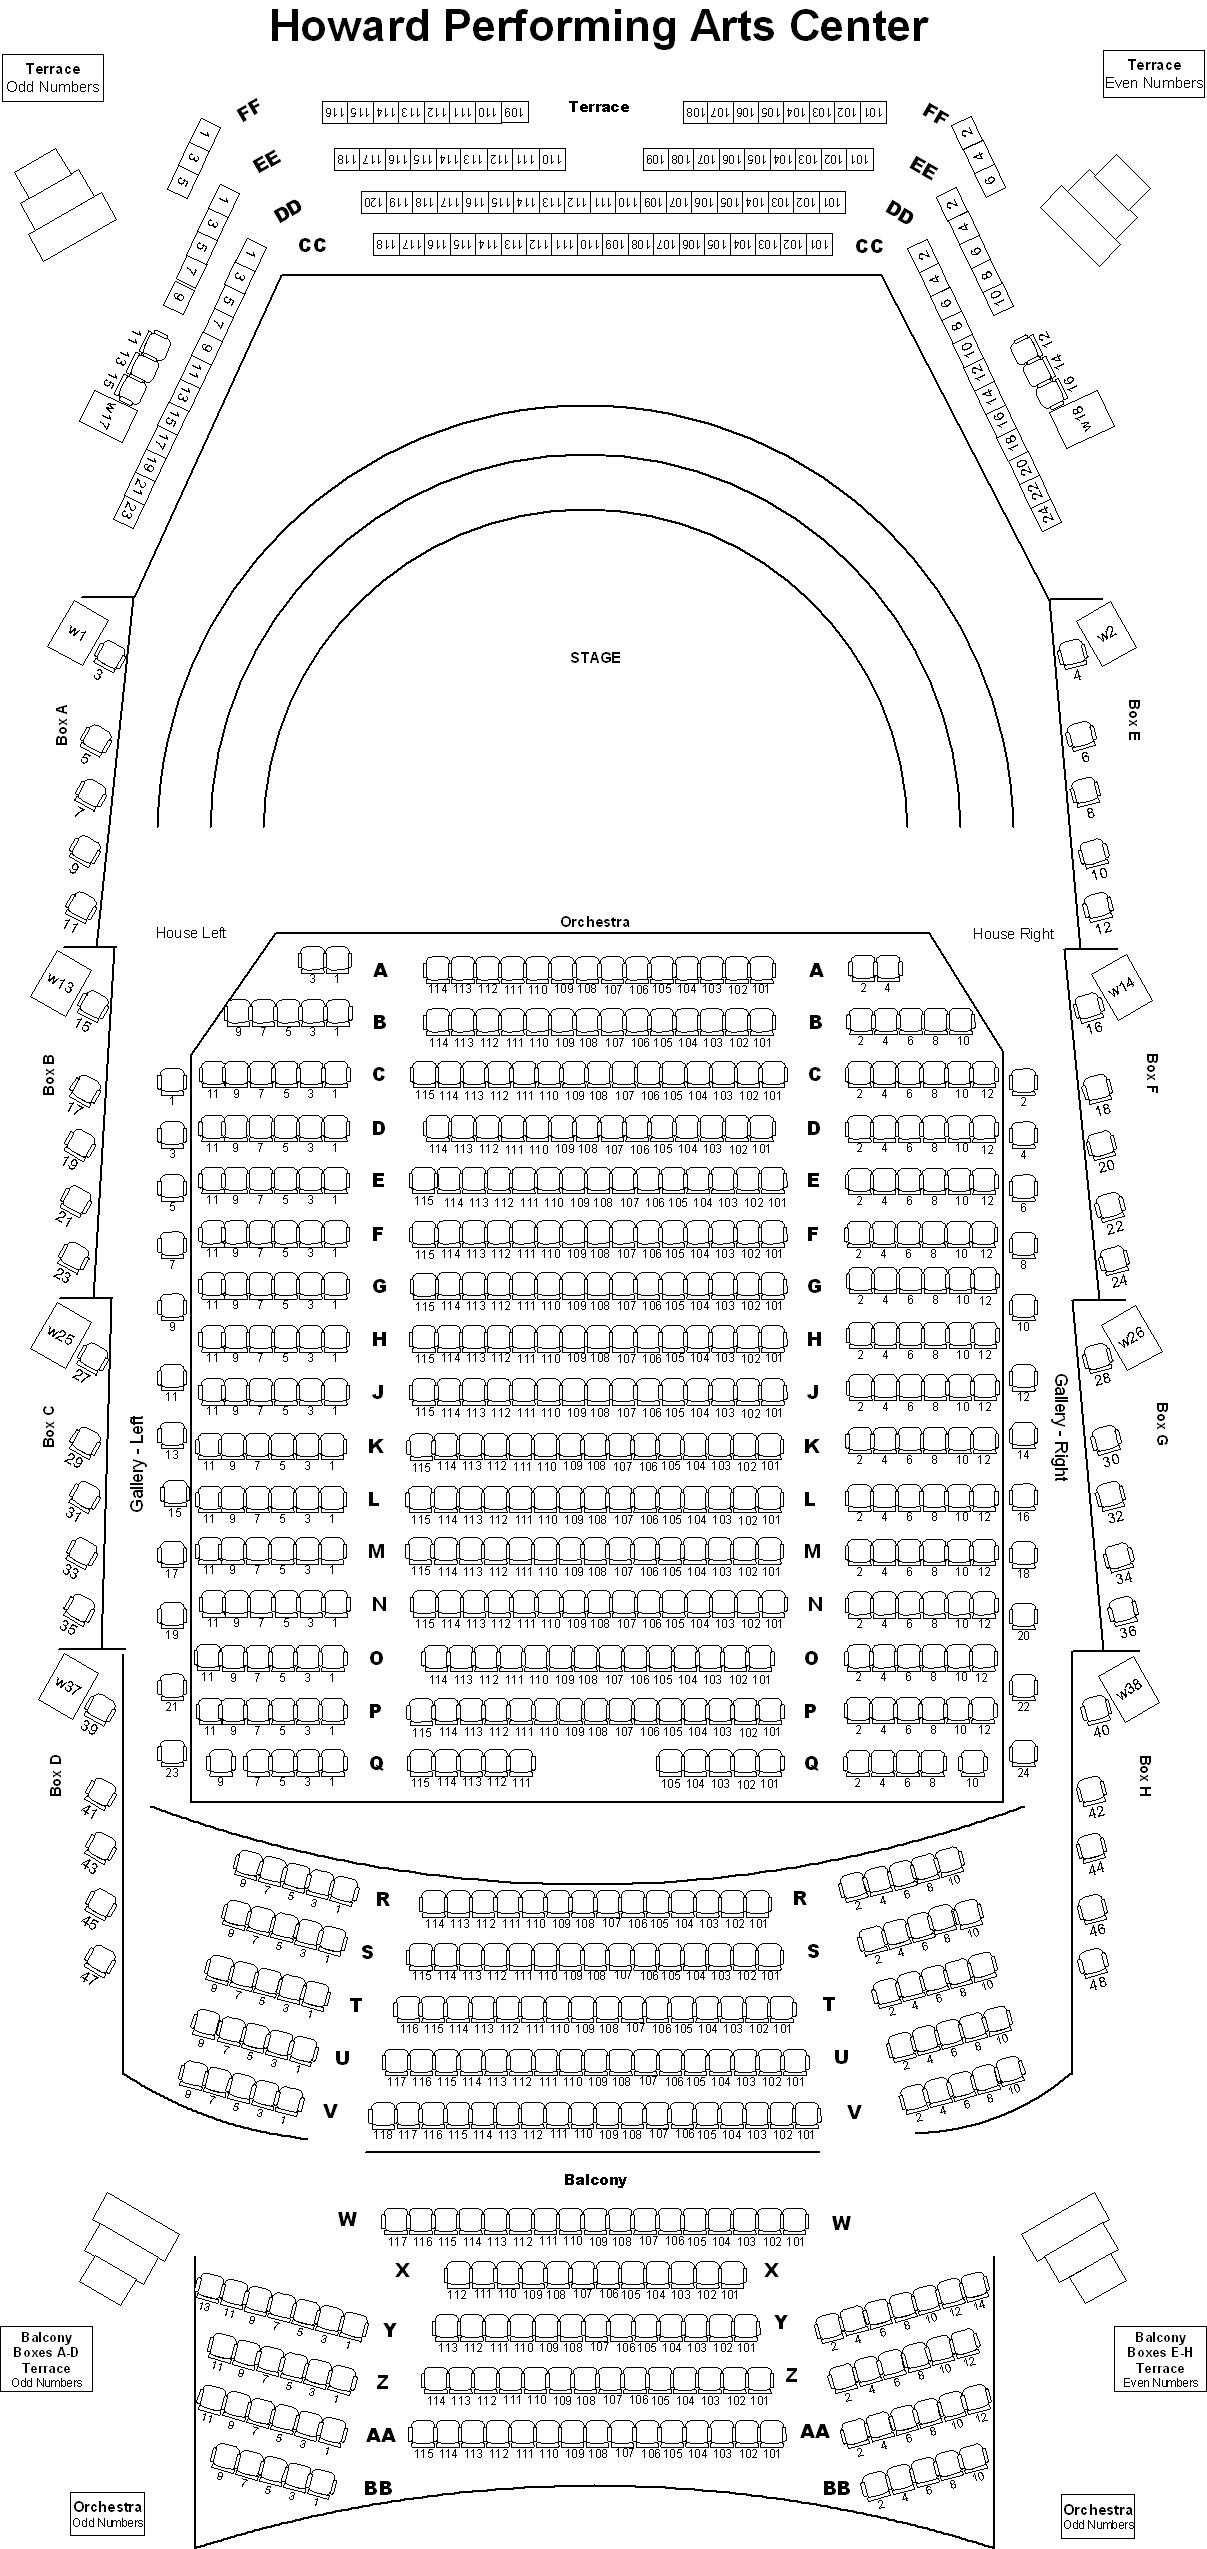 Seating Chart Howard Performing Arts Center Andrews